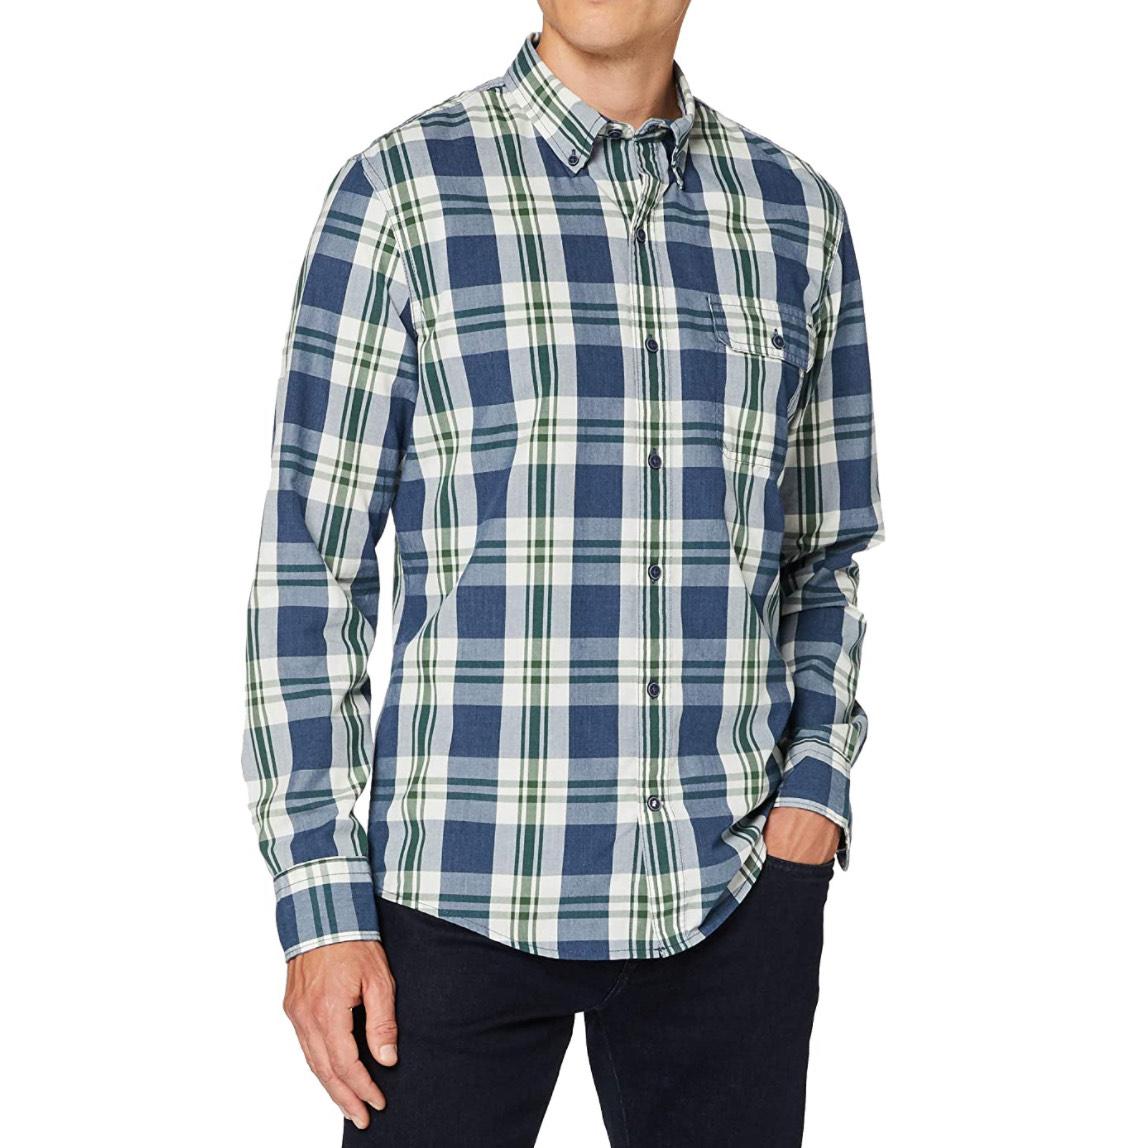 Camisa cuadros Izod hombre talla S.